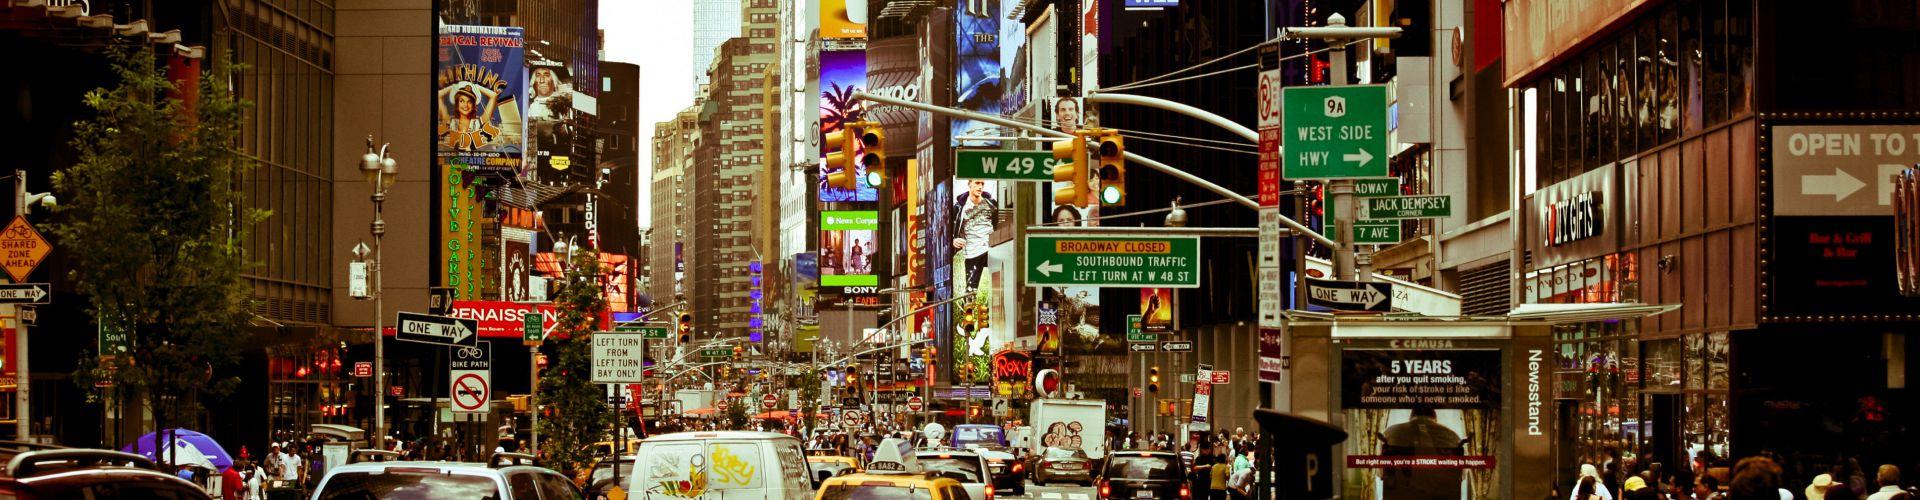 Best lesbian hotels new york city